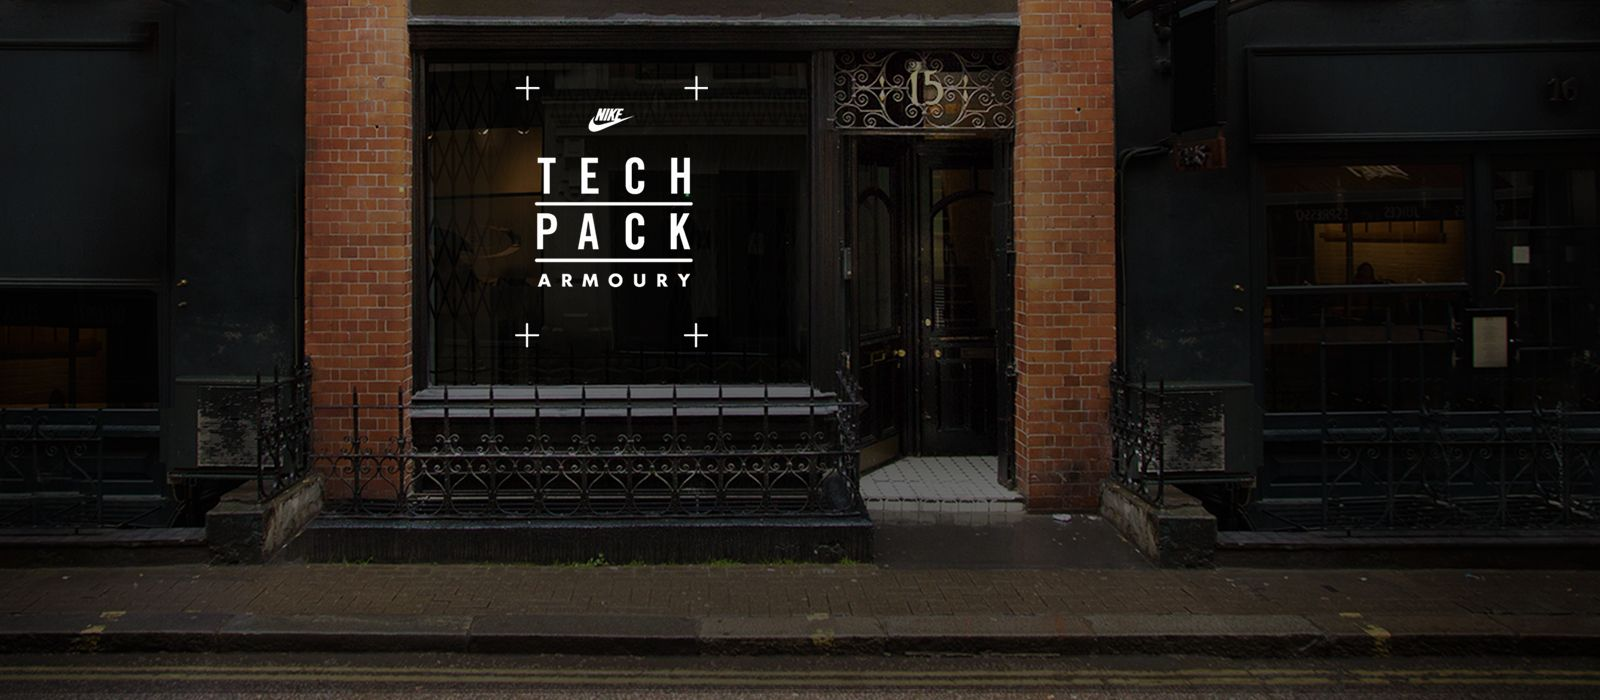 nike-tech-pack-armoury-experience-00